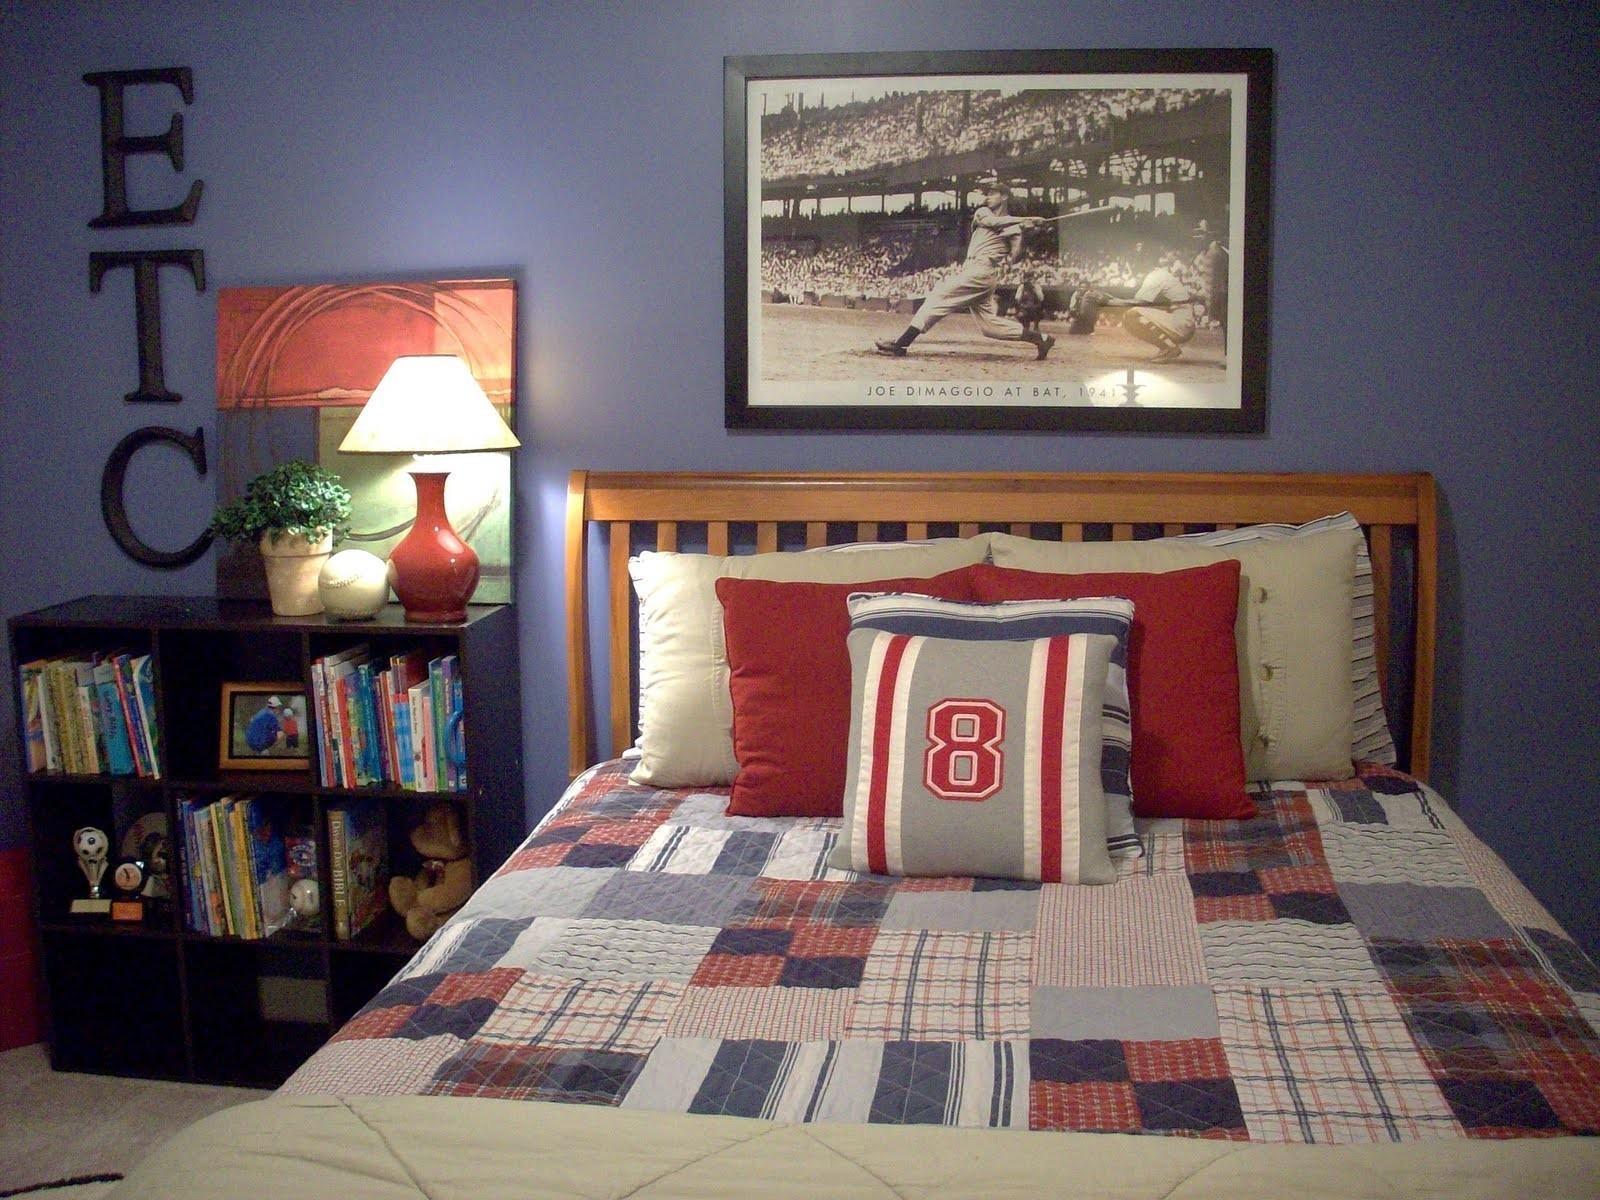 Nursery Beddings Sports Themed Wall Art Plus Vintage Baseball With Regard To Vintage Baseball Wall Art (Image 13 of 20)